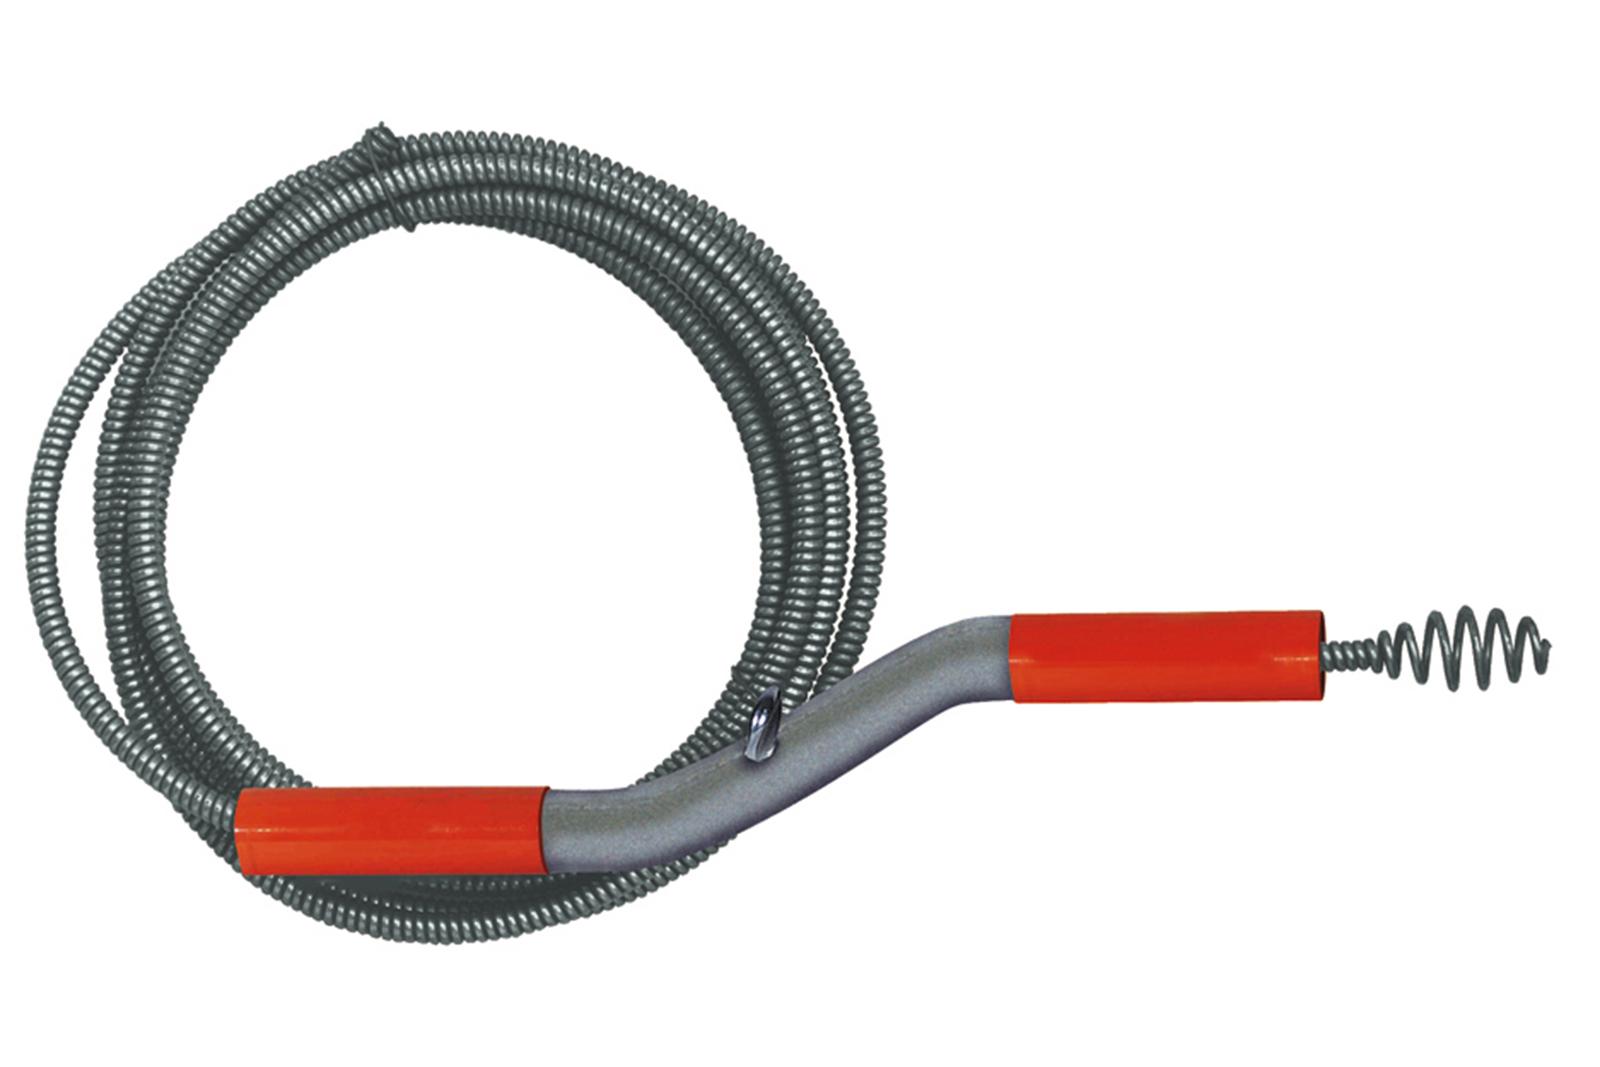 Трос для прочистки General pipe Flexicore 50fl1-a